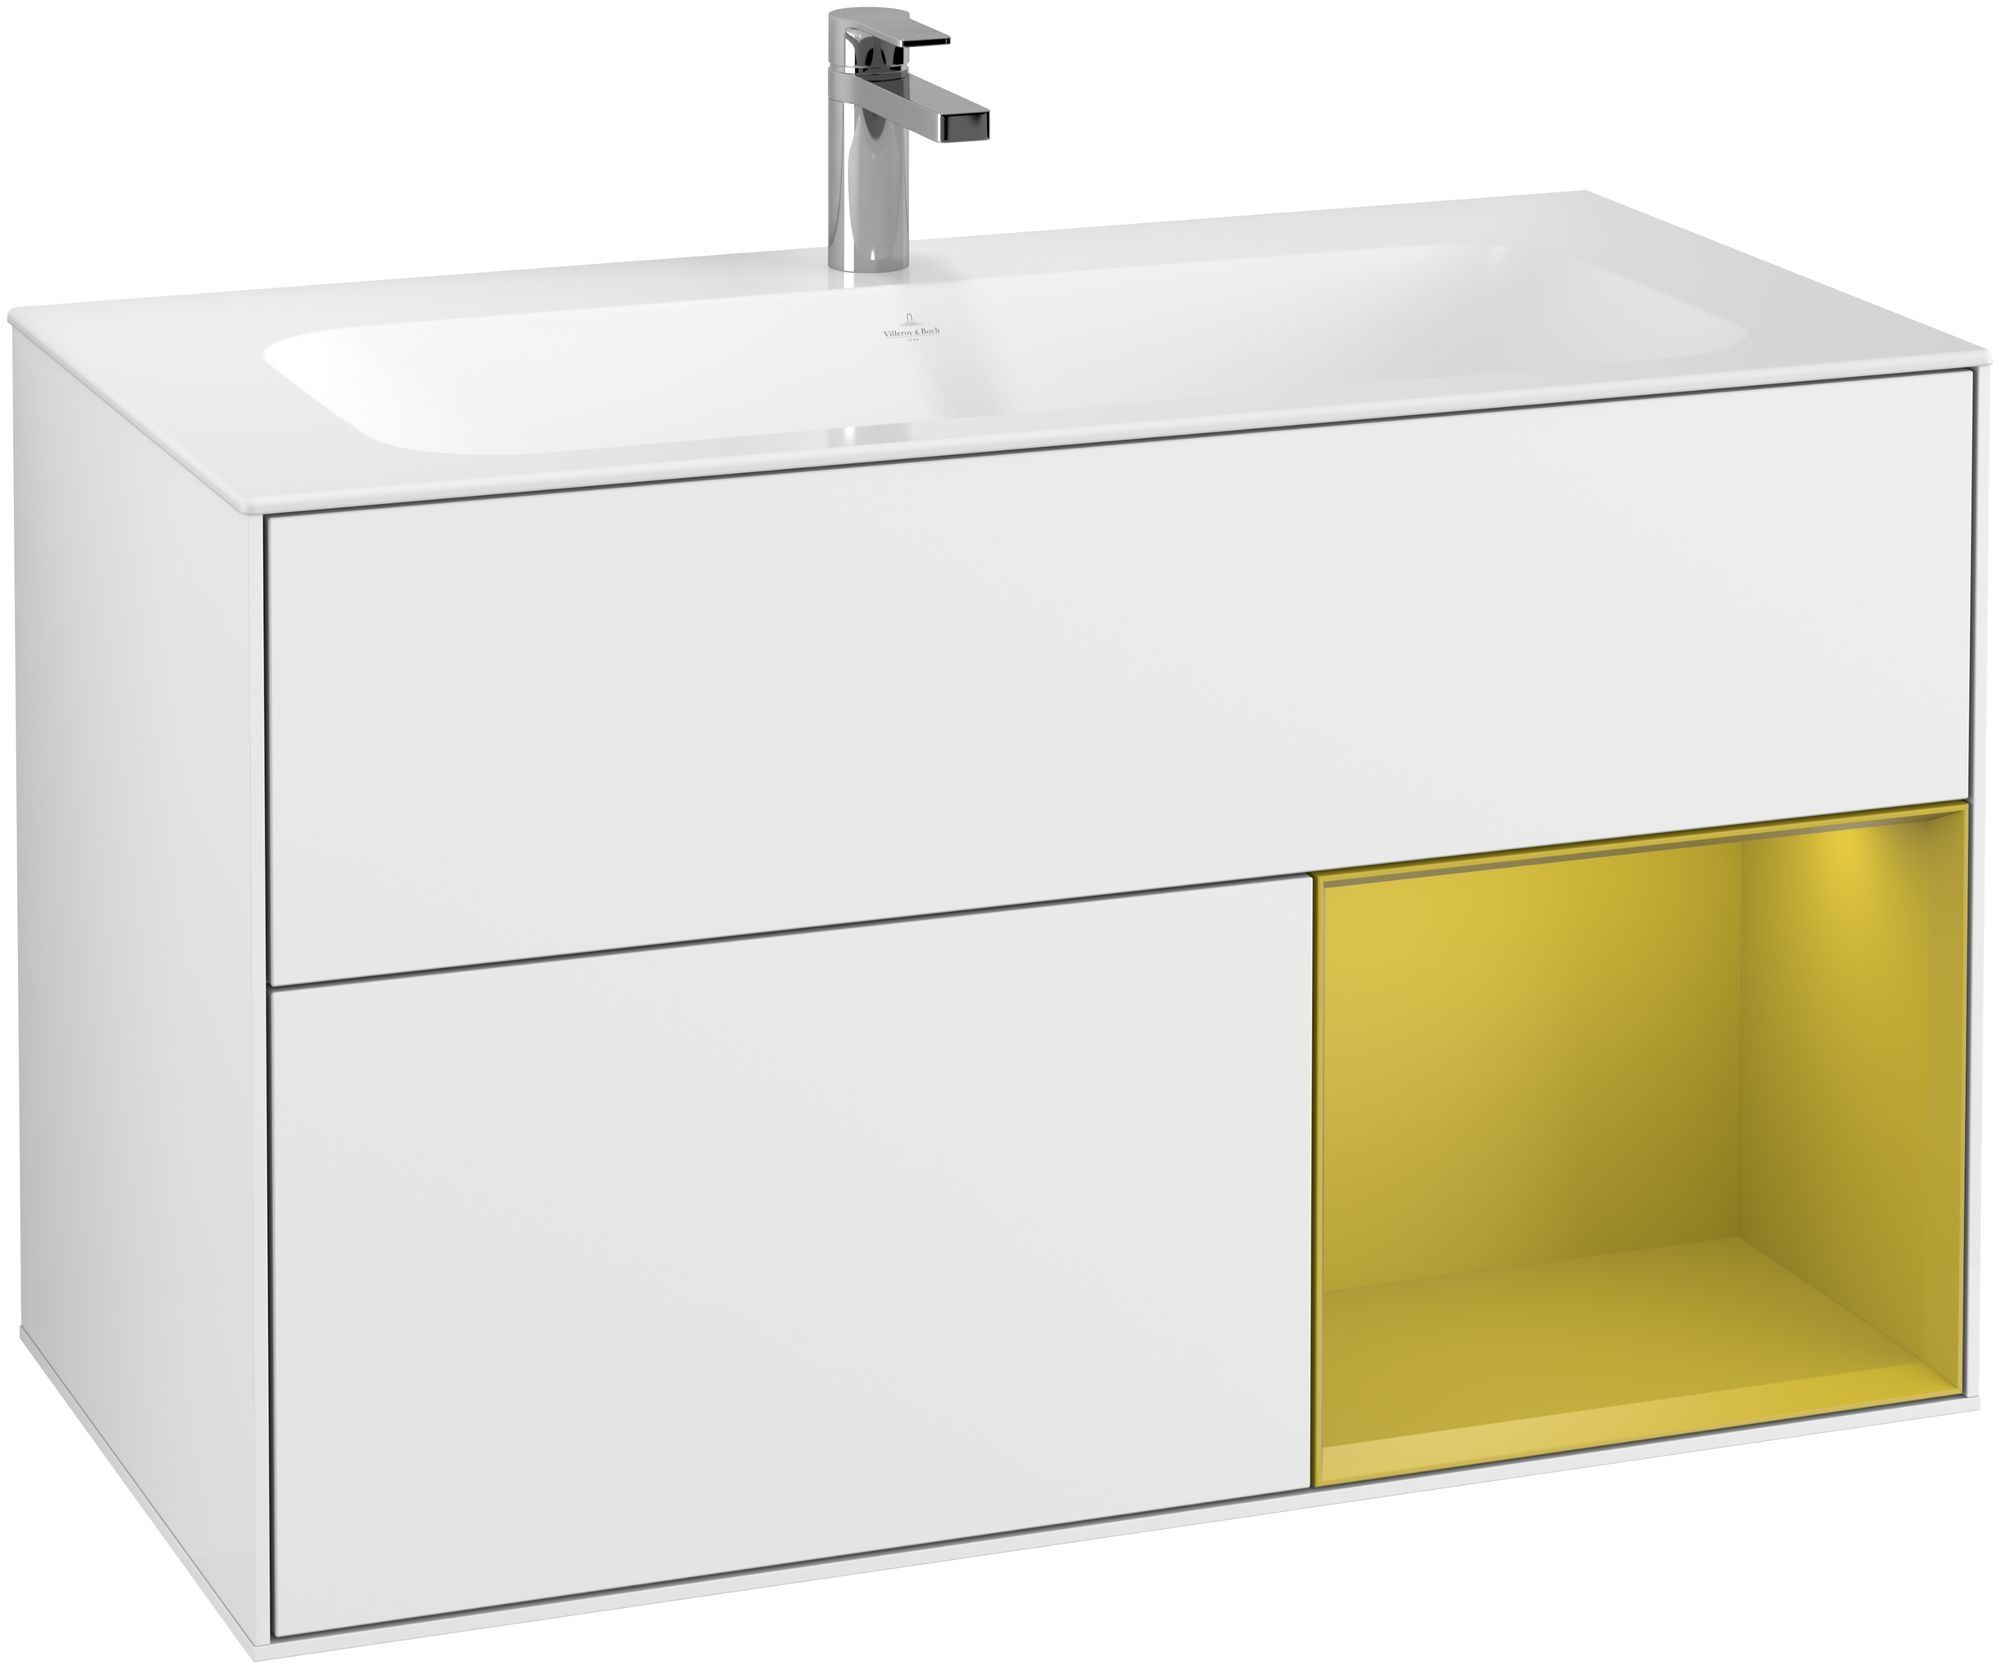 Villeroy & Boch Finion G04 Waschtischunterschrank mit Regalelement 2 Auszüge LED-Beleuchtung B:99,6xH:59,1xT:49,8cm Front, Korpus: Glossy White Lack, Regal: Sun G040HEGF